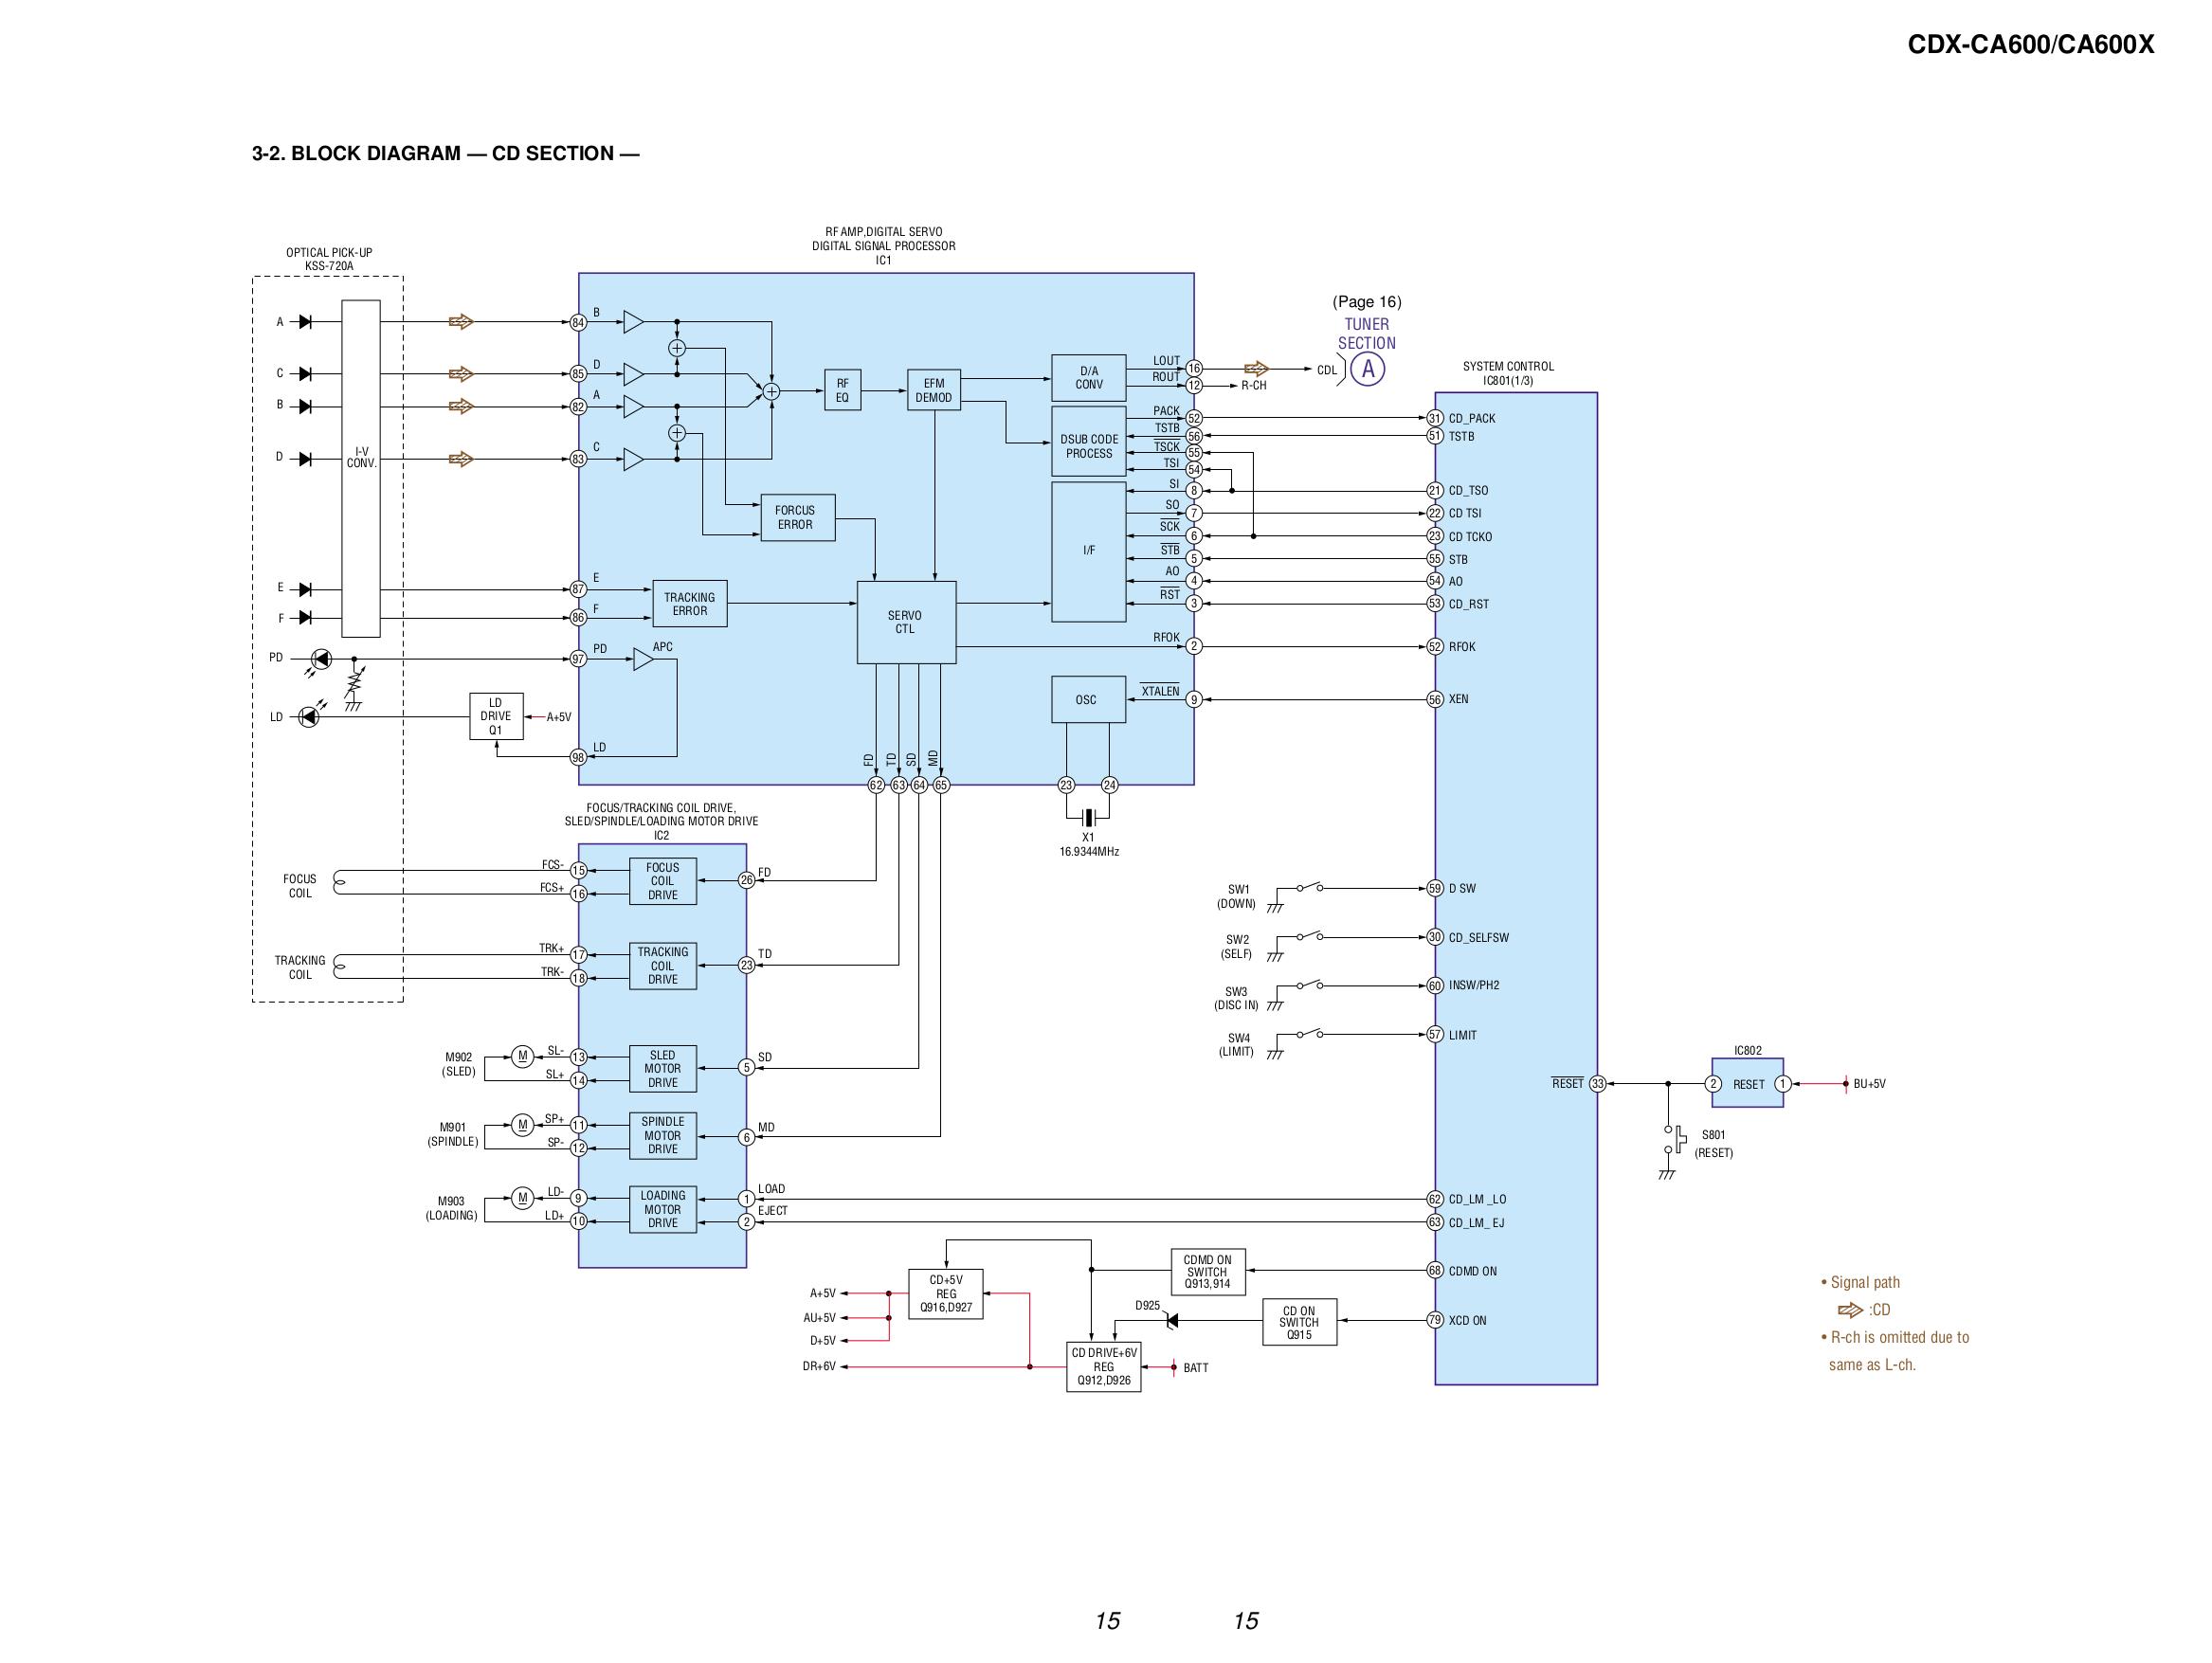 Sony Cdx Gt24W Wiring Diagram from srv2.umlib.com